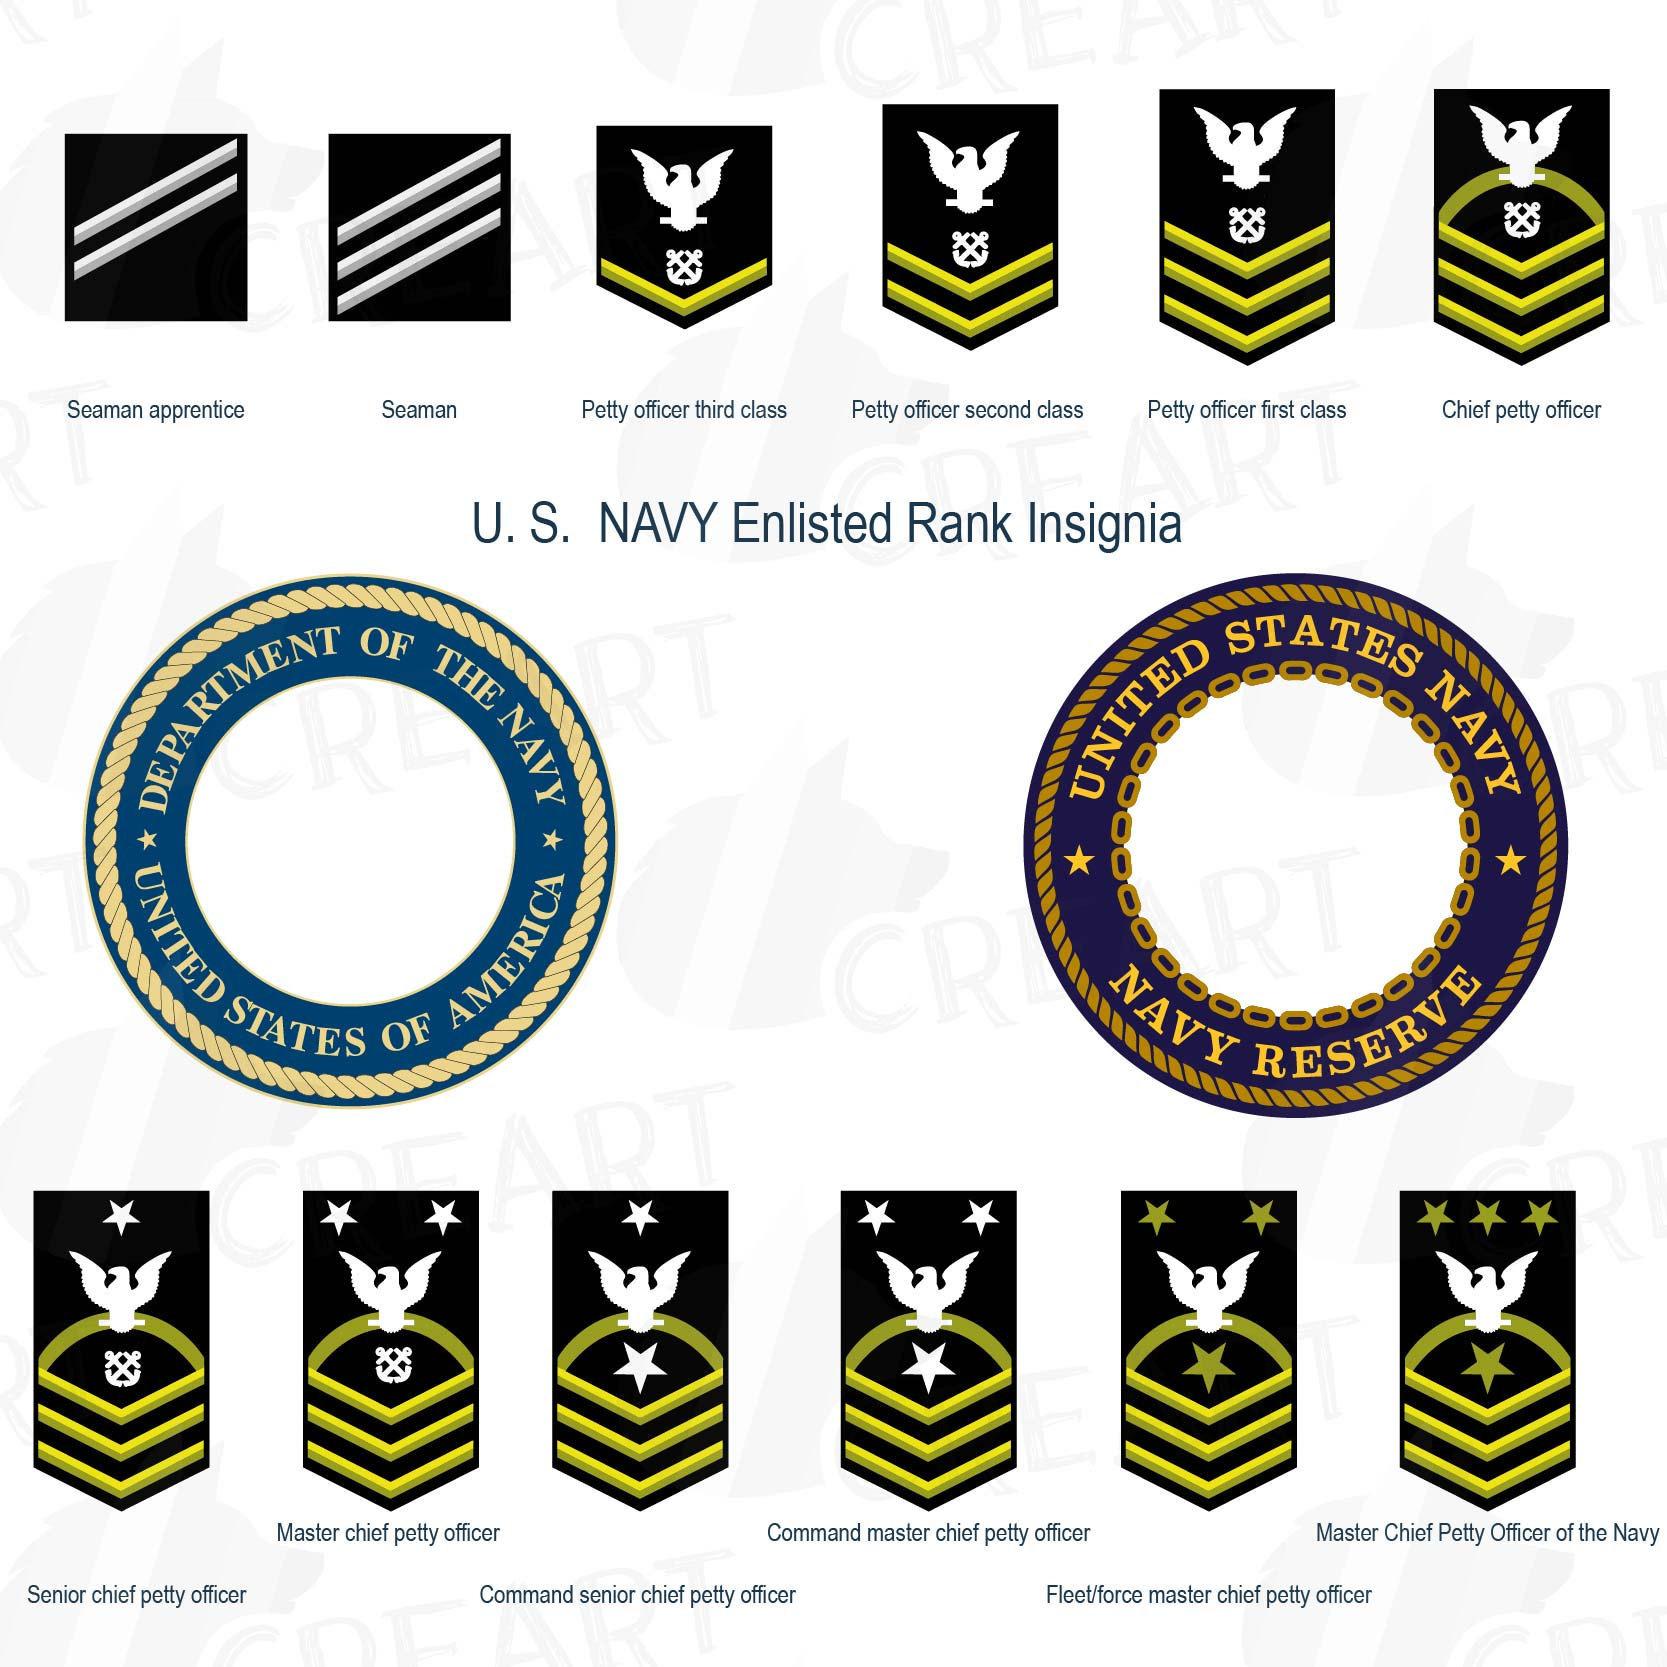 1667x1667 United States Navy Frame And Ranks, Usn Navy Ranks Insignia Clip